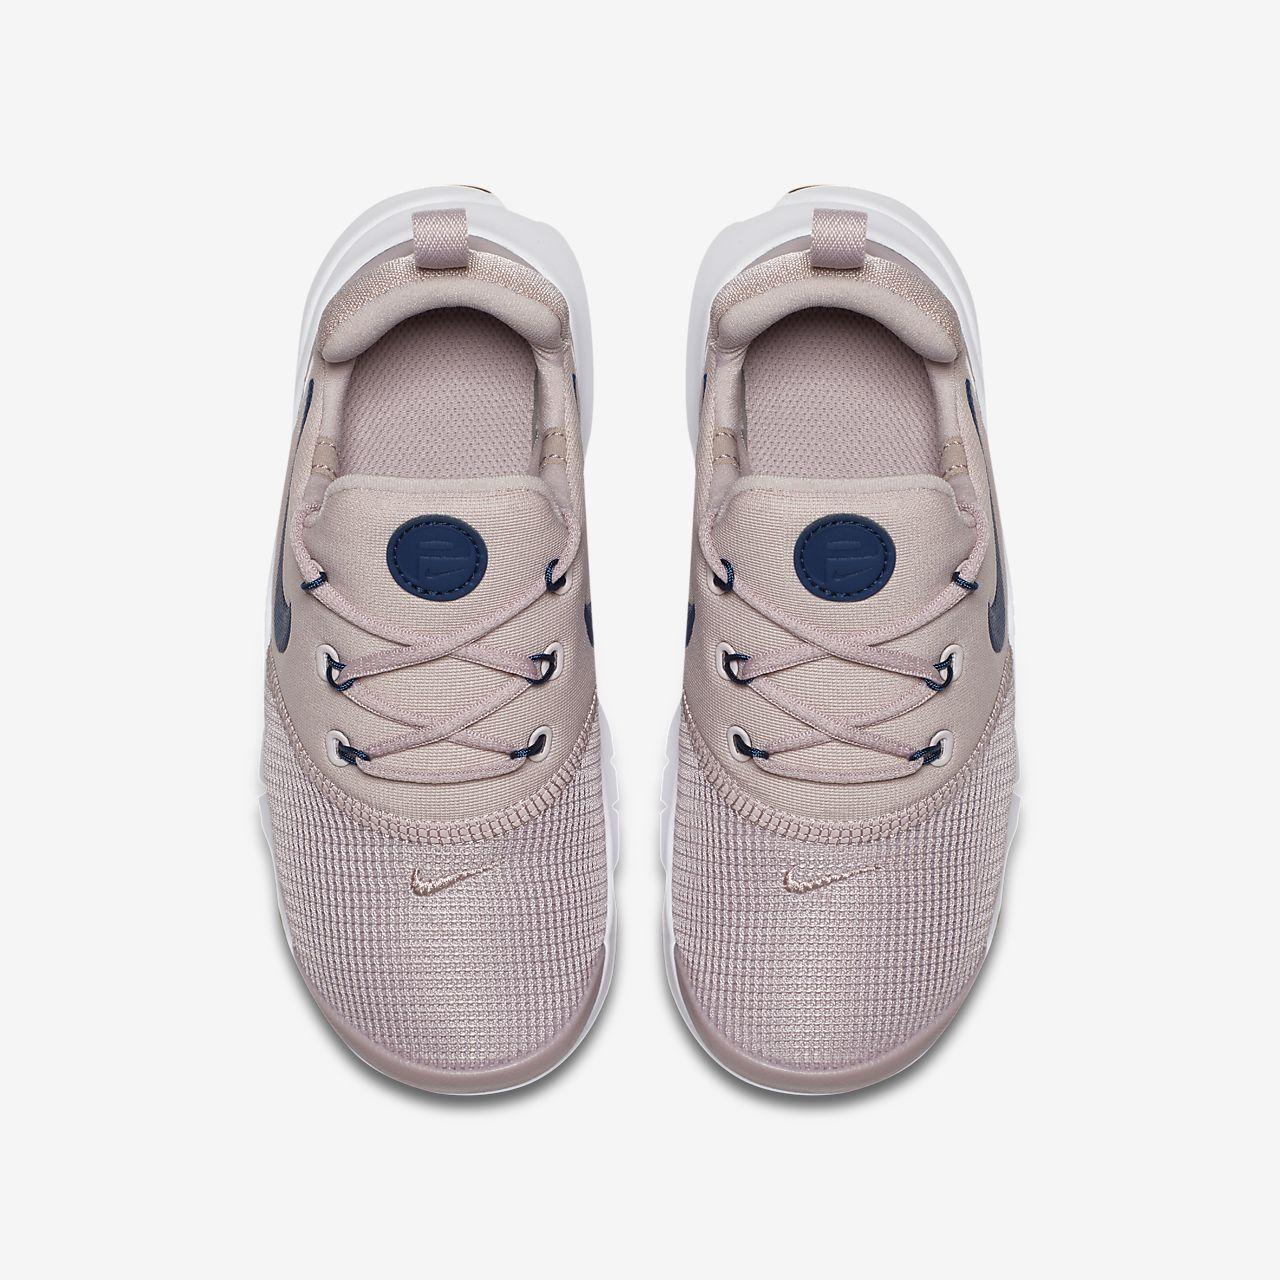 ... Nike Presto Fly Younger Kids' Shoe